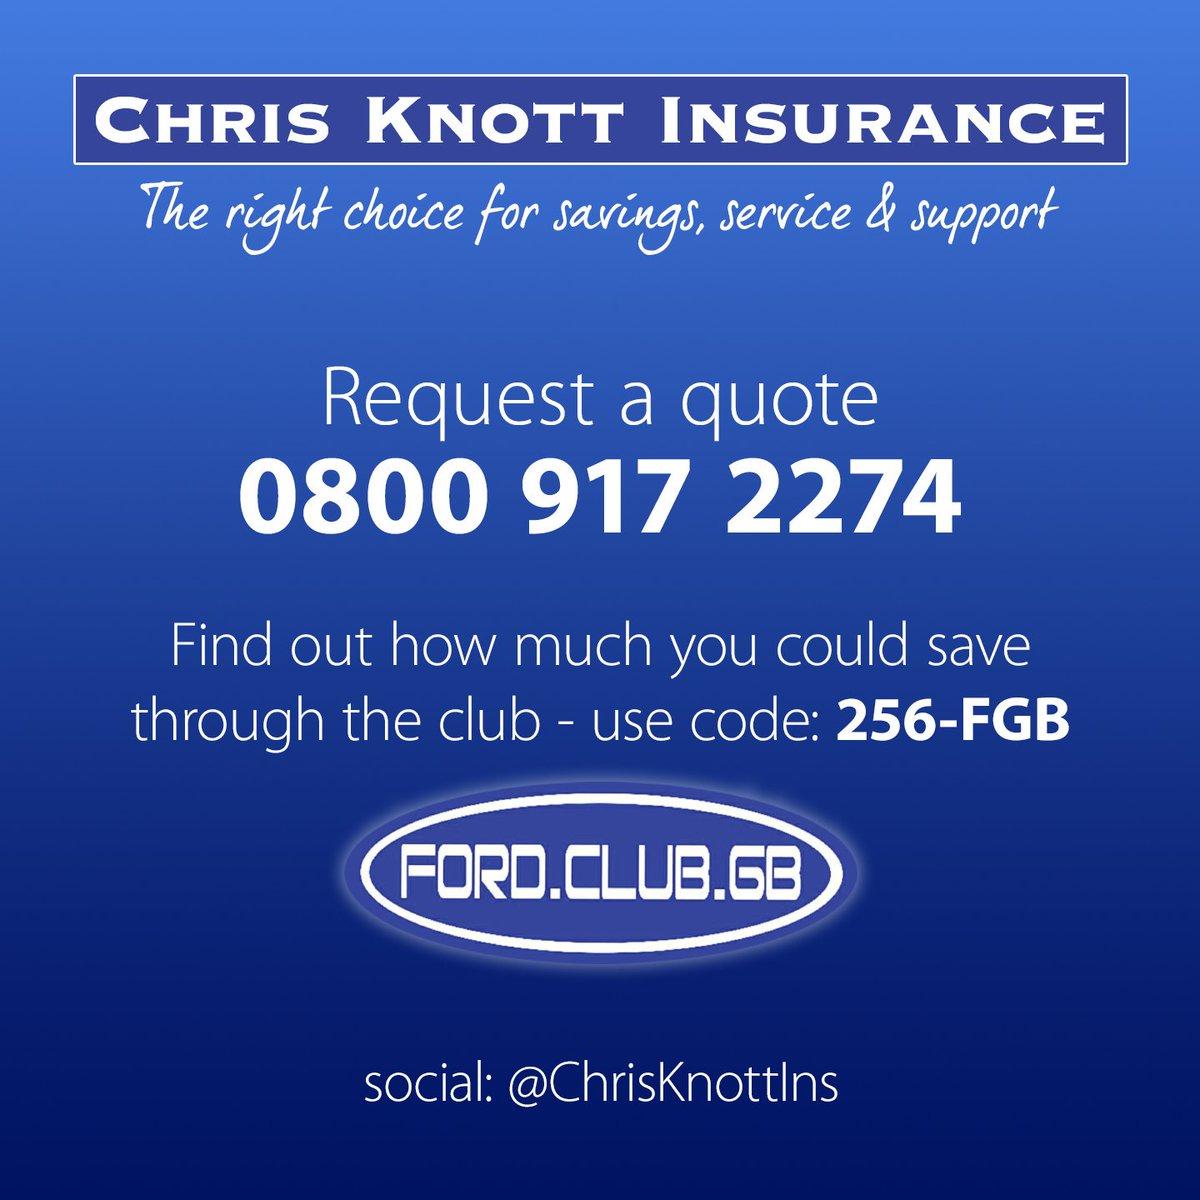 Chris Knott Insurance >> Chrisknottinsurance Chrisknottins Twitter